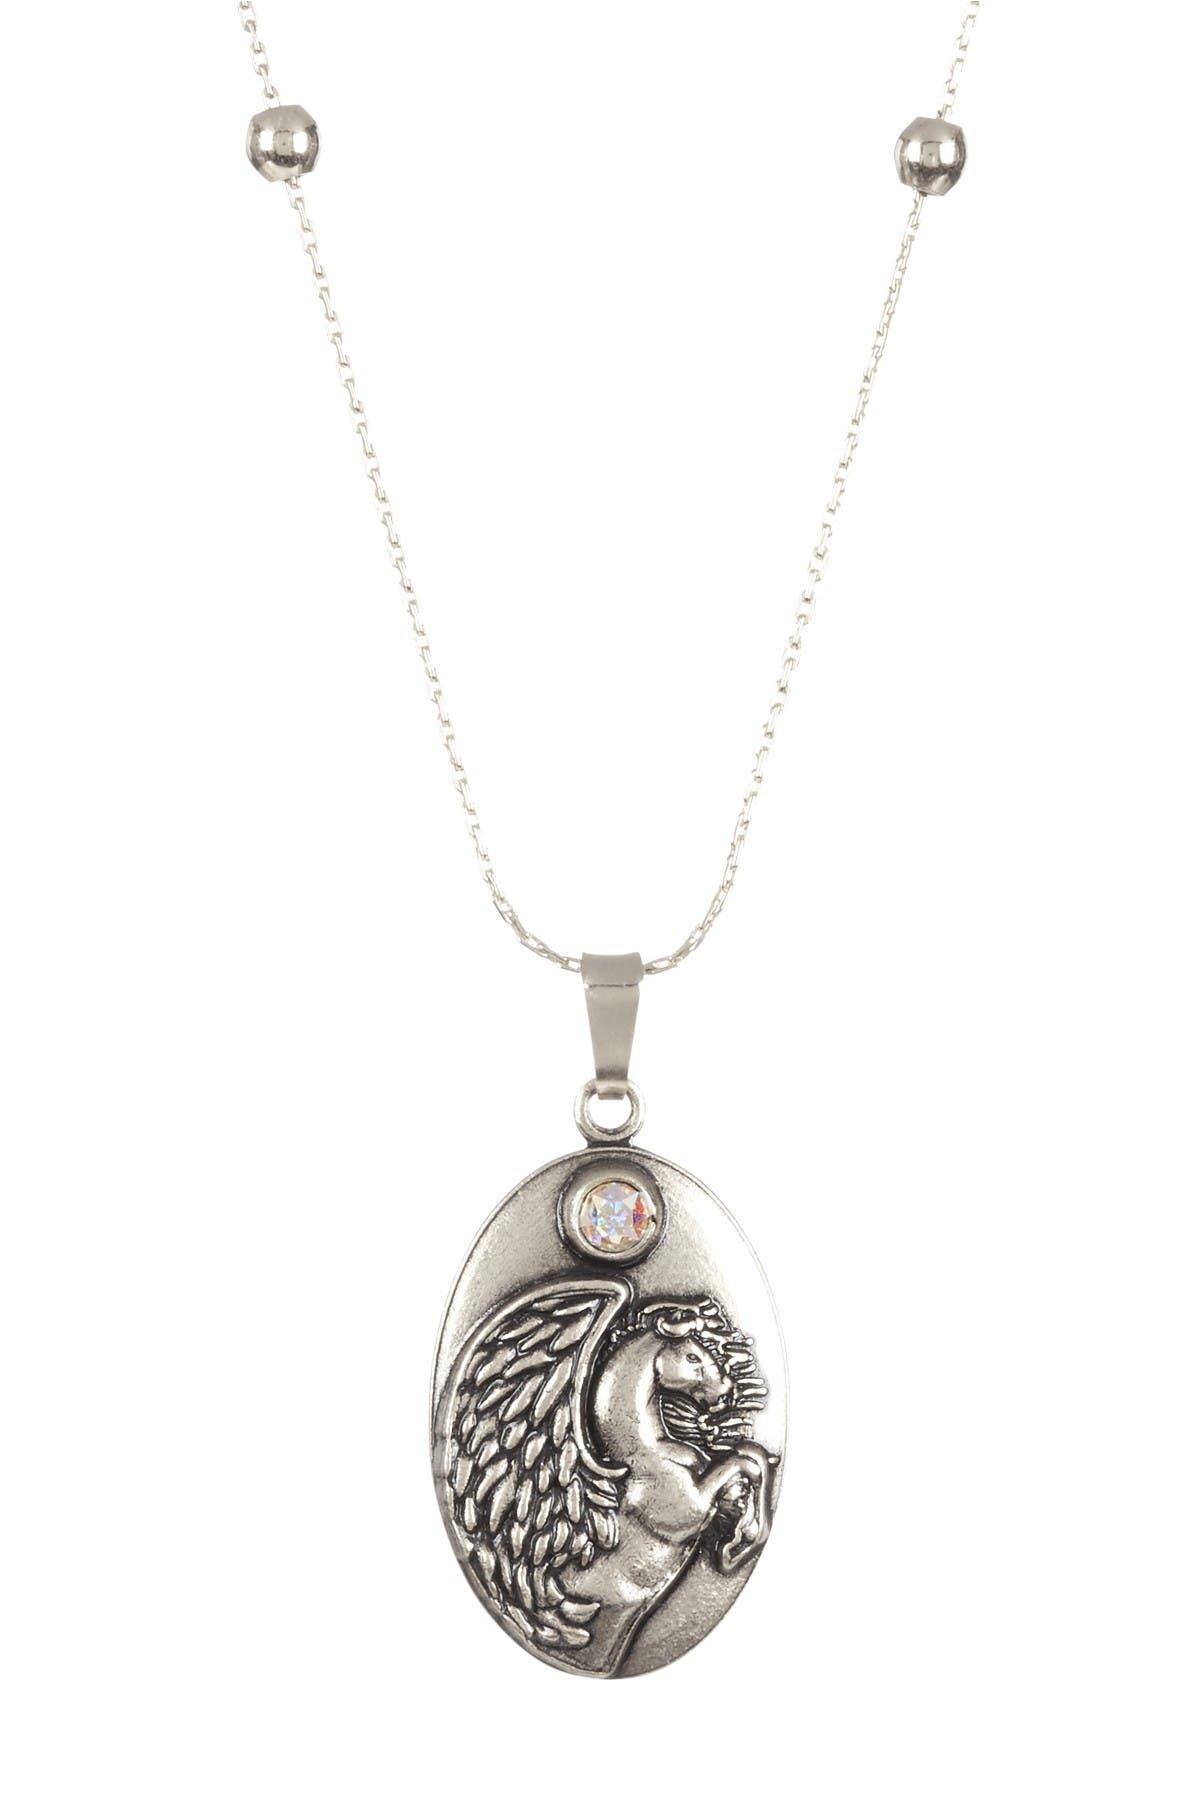 Image of Alex and Ani Pegasus Swarovski Crystal Beaded Station Pendant Necklace